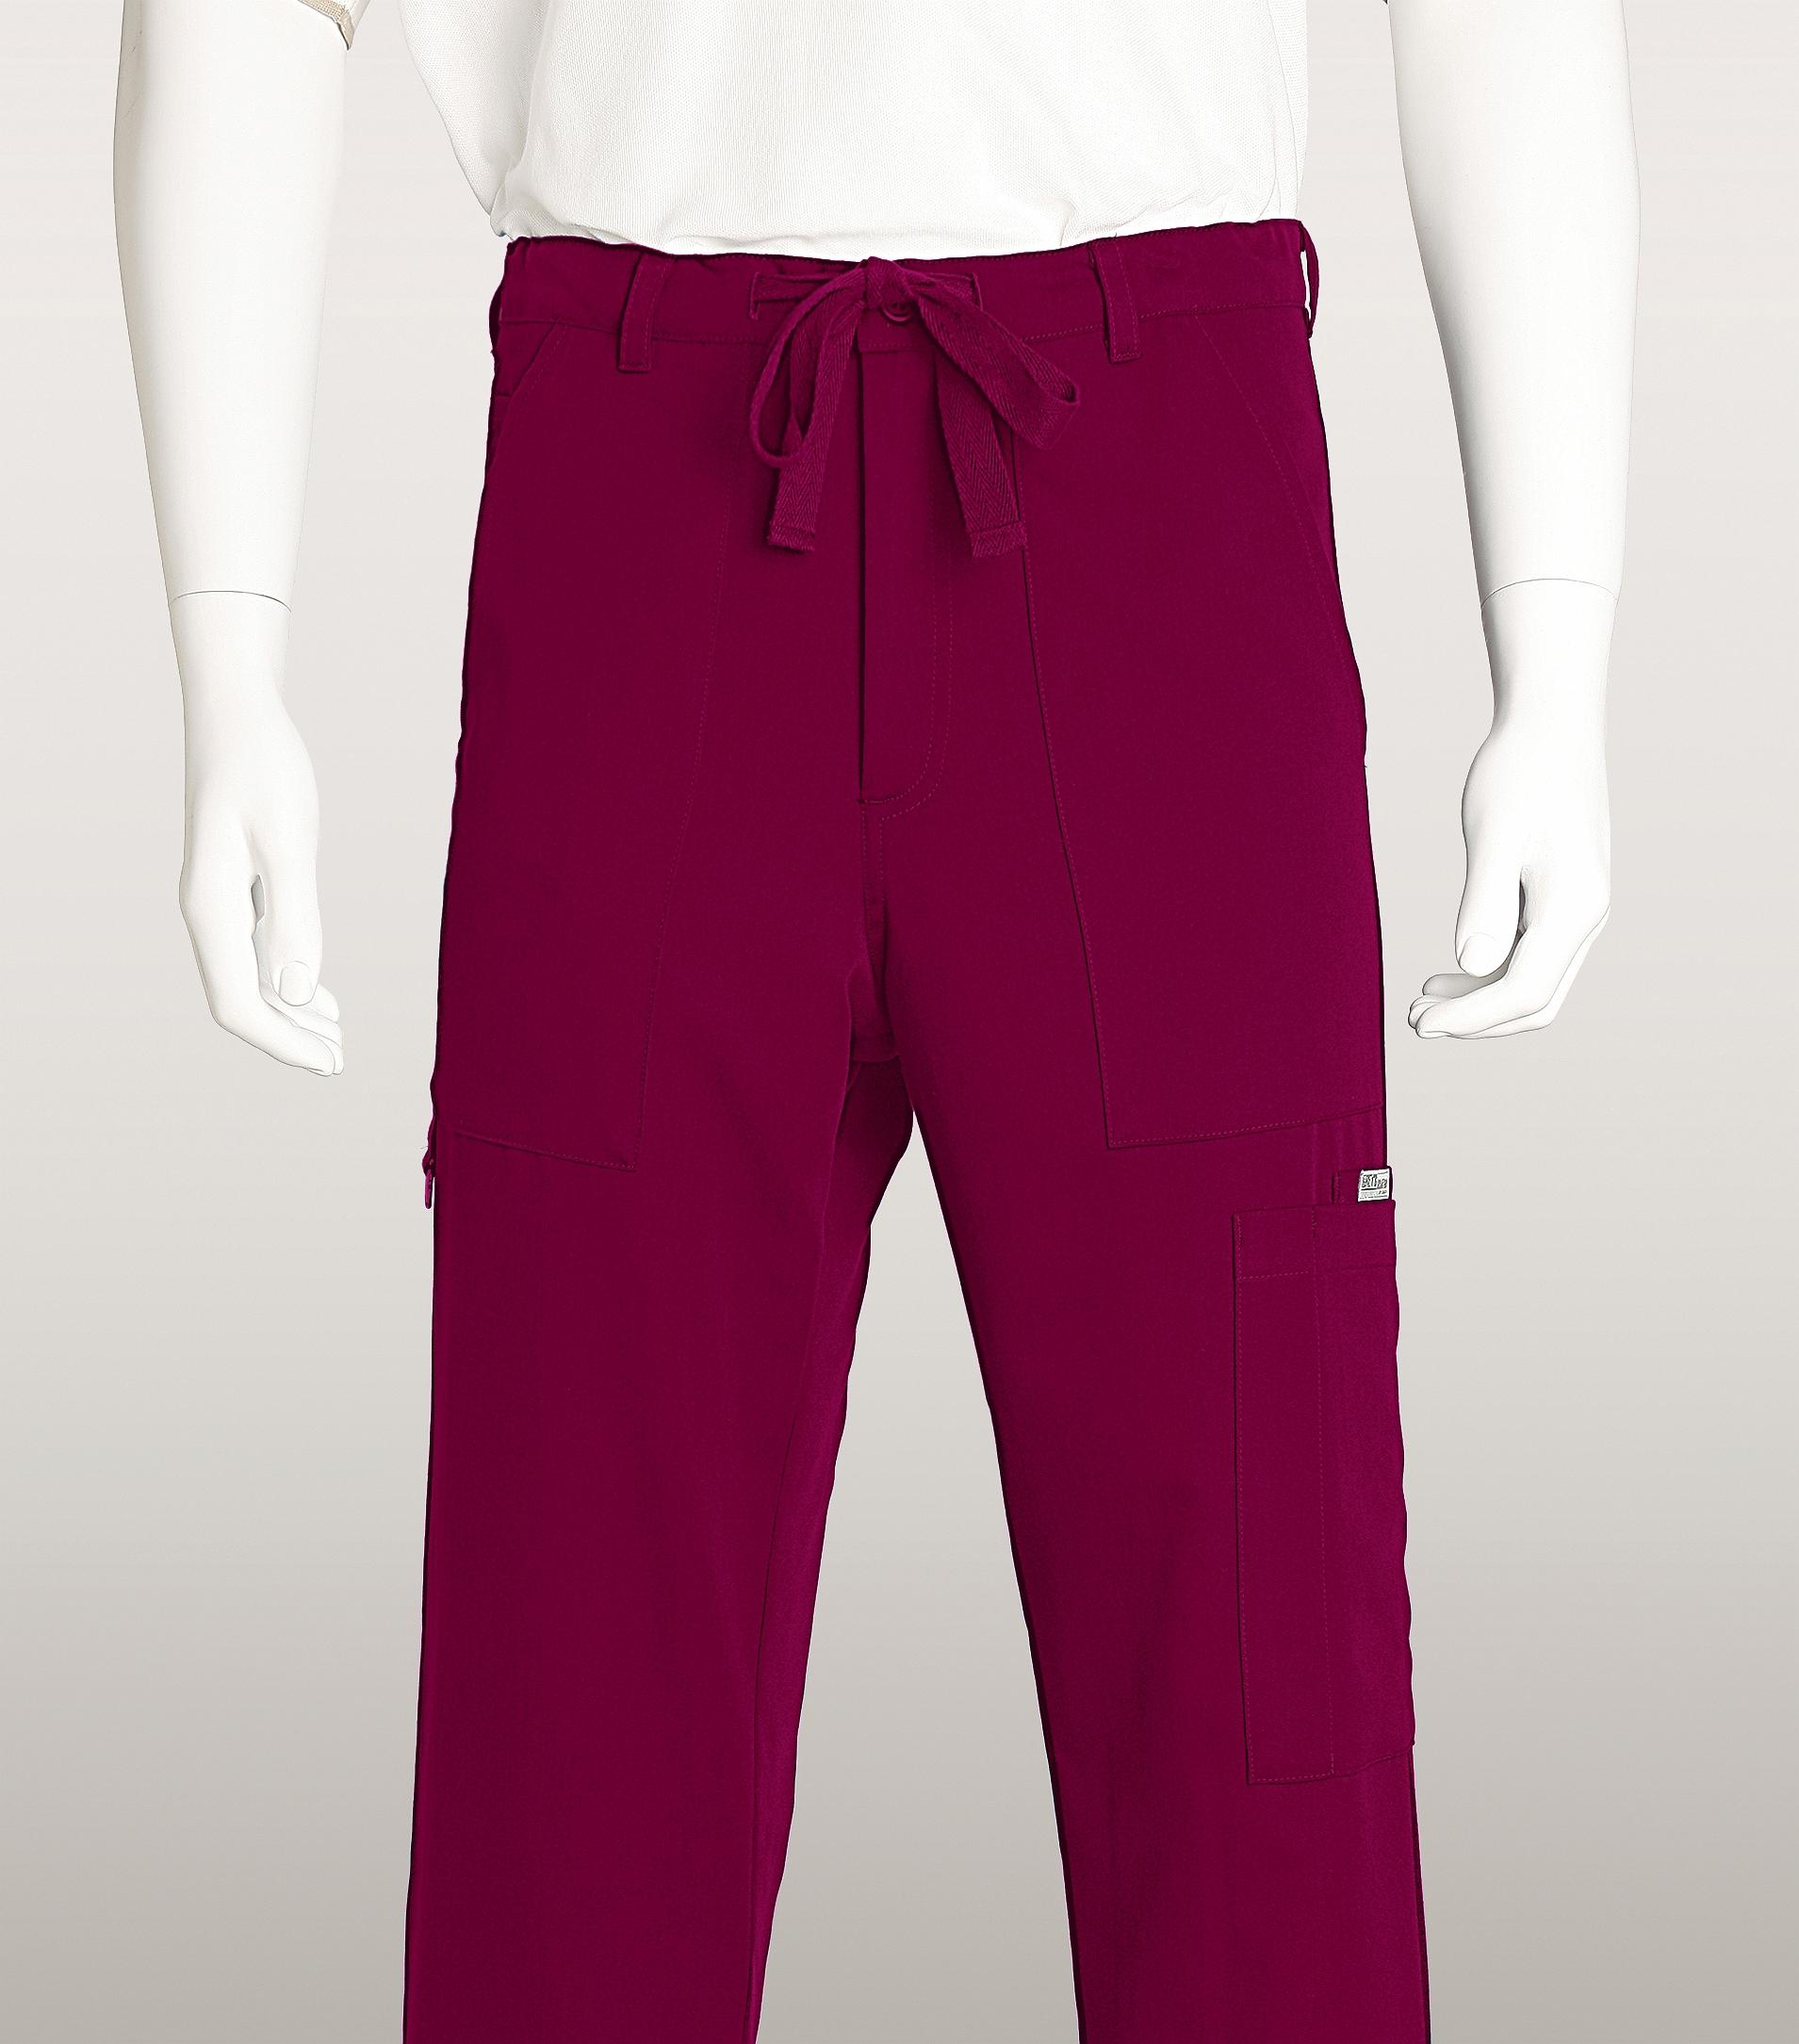 55bb99c46b9 Grey's Anatomy Men's Zip Fly Drawstring Utility Scrub Pants-0203 | Medical  Scrubs Collection